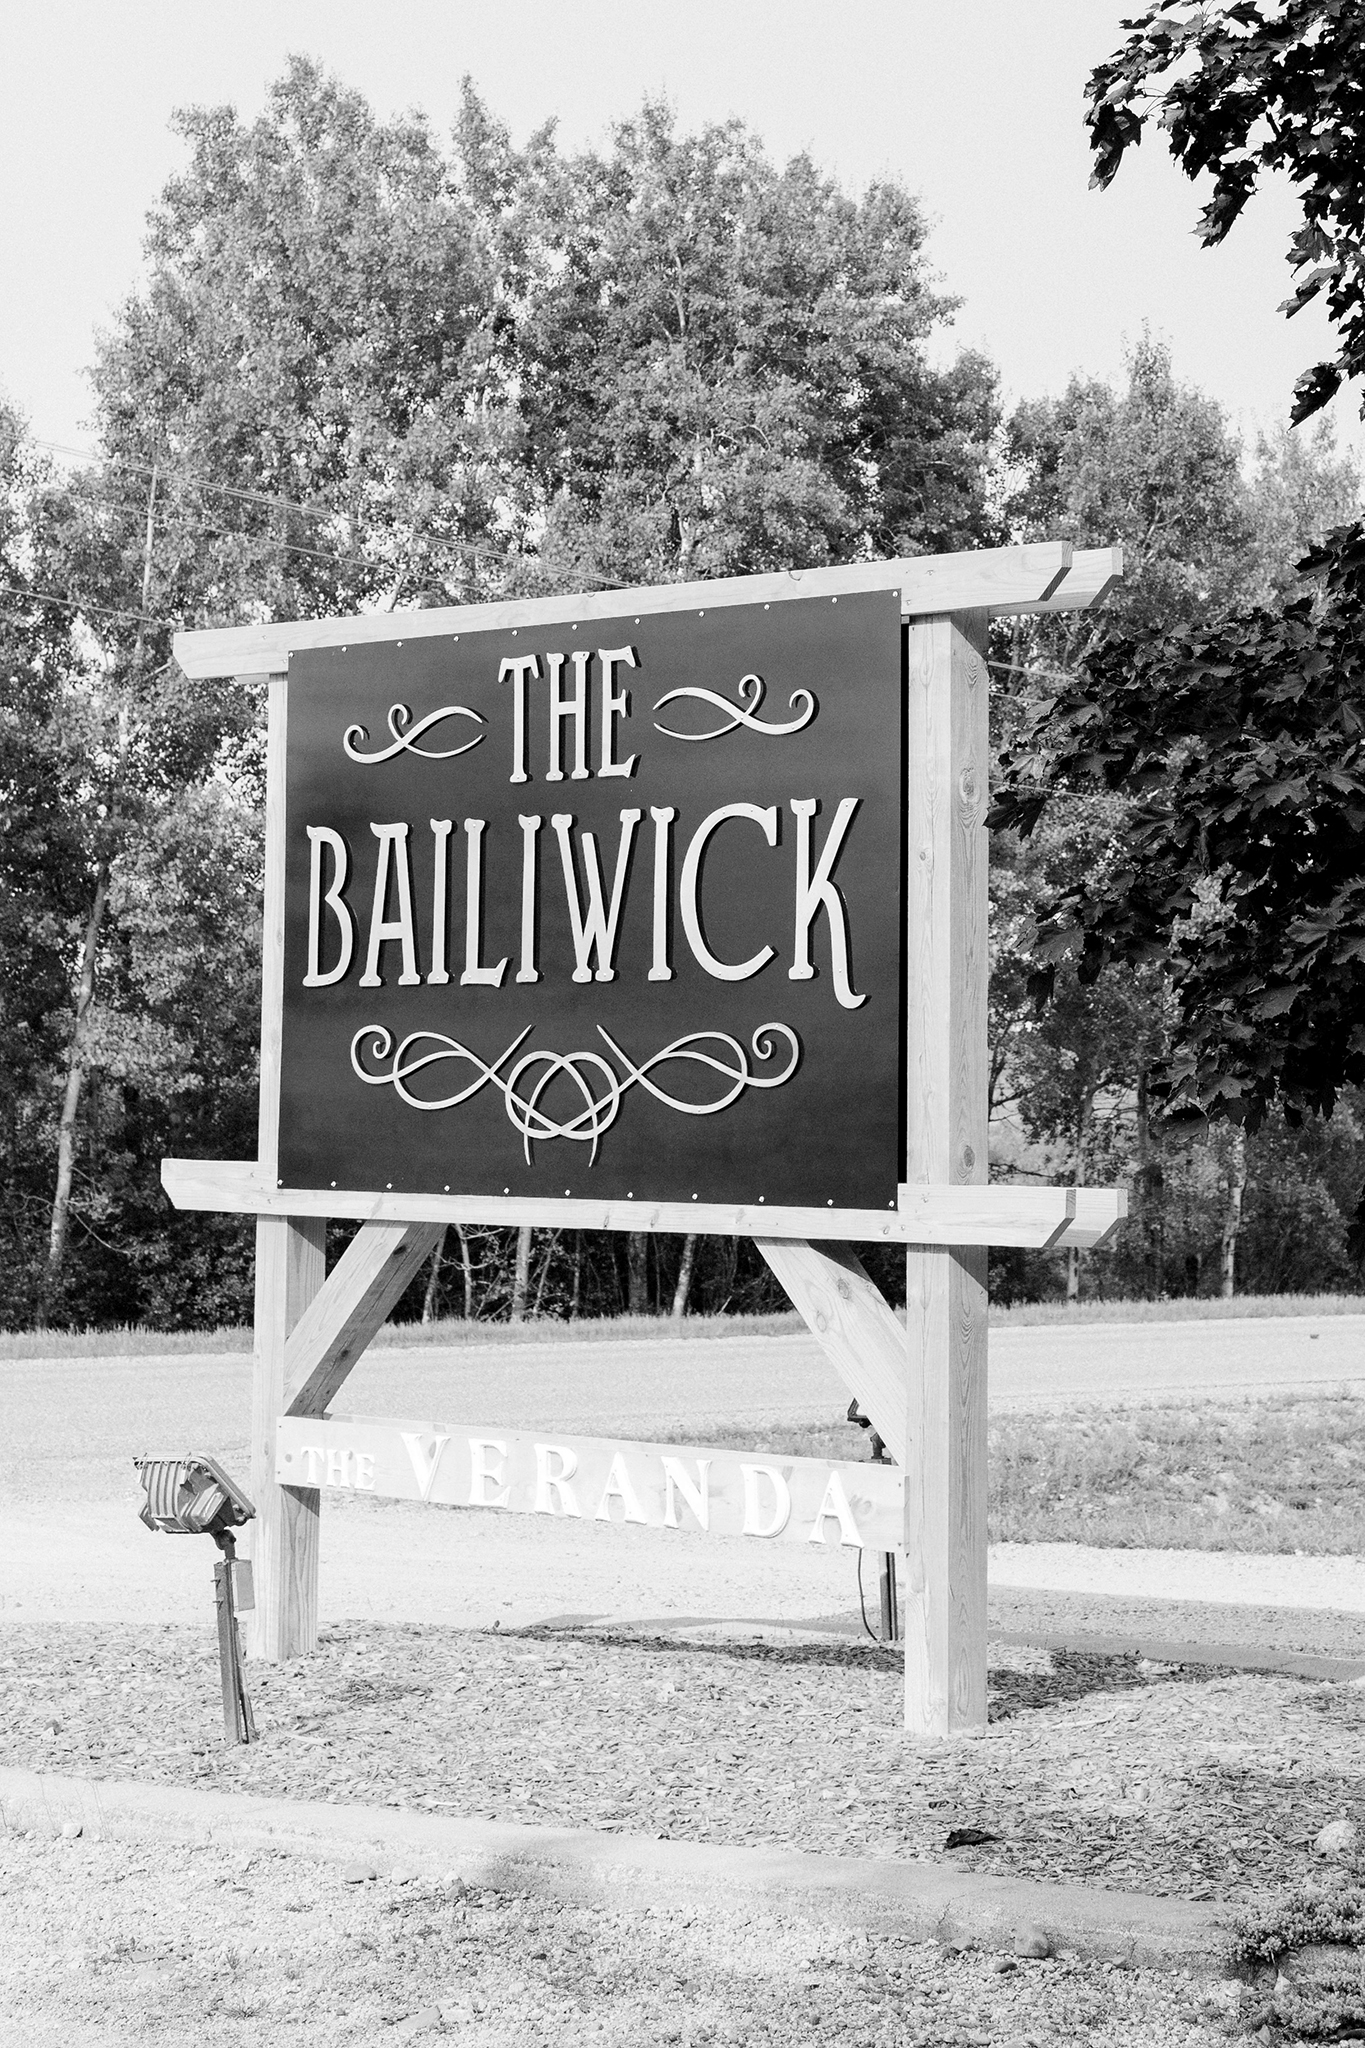 The-Bailiwick-Wedding-Venue-Medford-WI.jpg